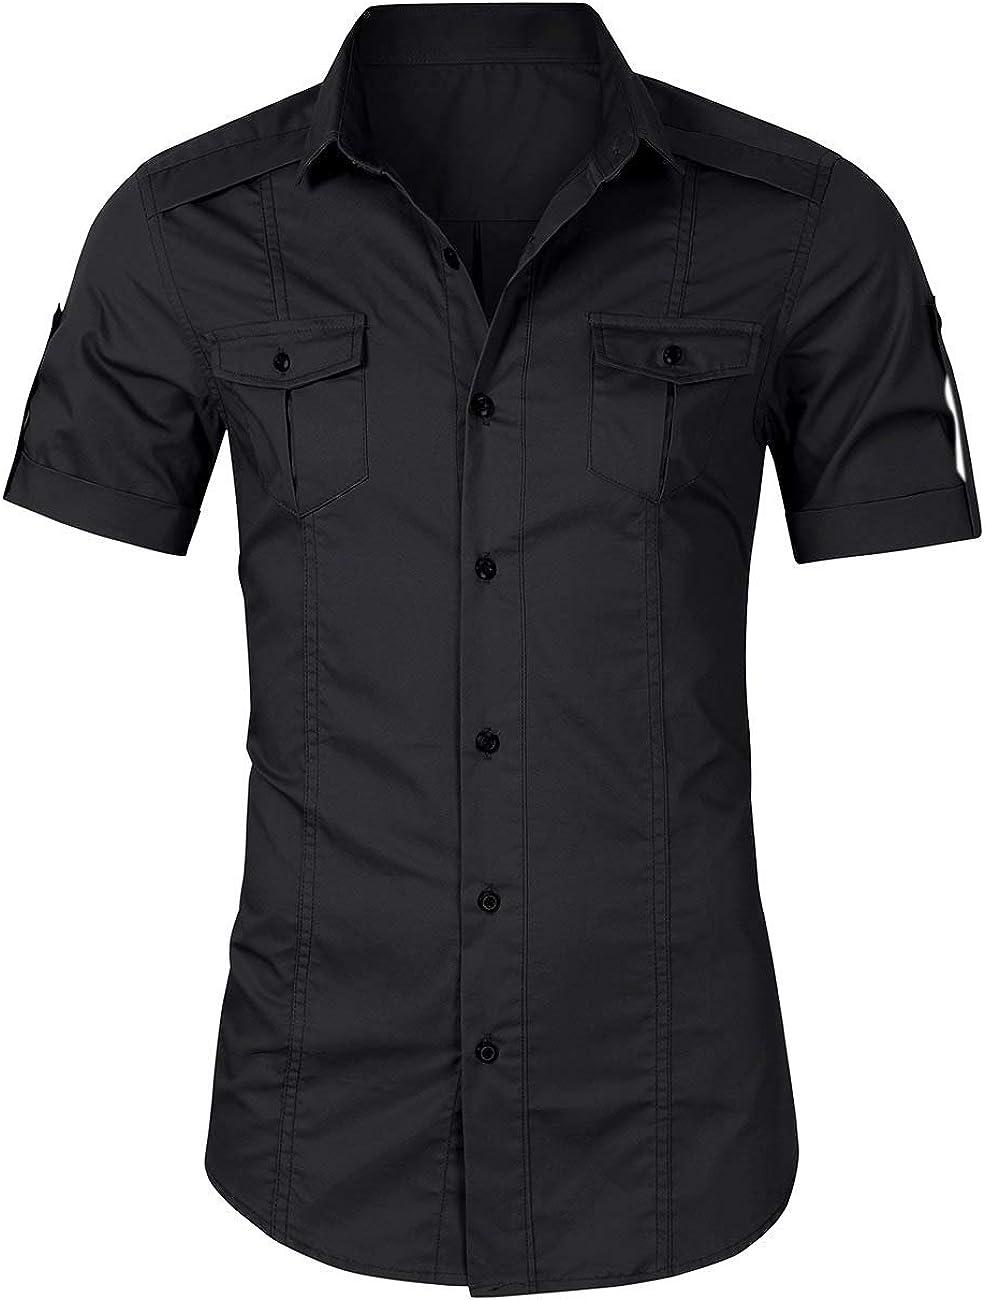 Satankud Men's Regular-Fit Shirts Short/Long Sleeve Cotton Casual Dress Shirt with Pockets